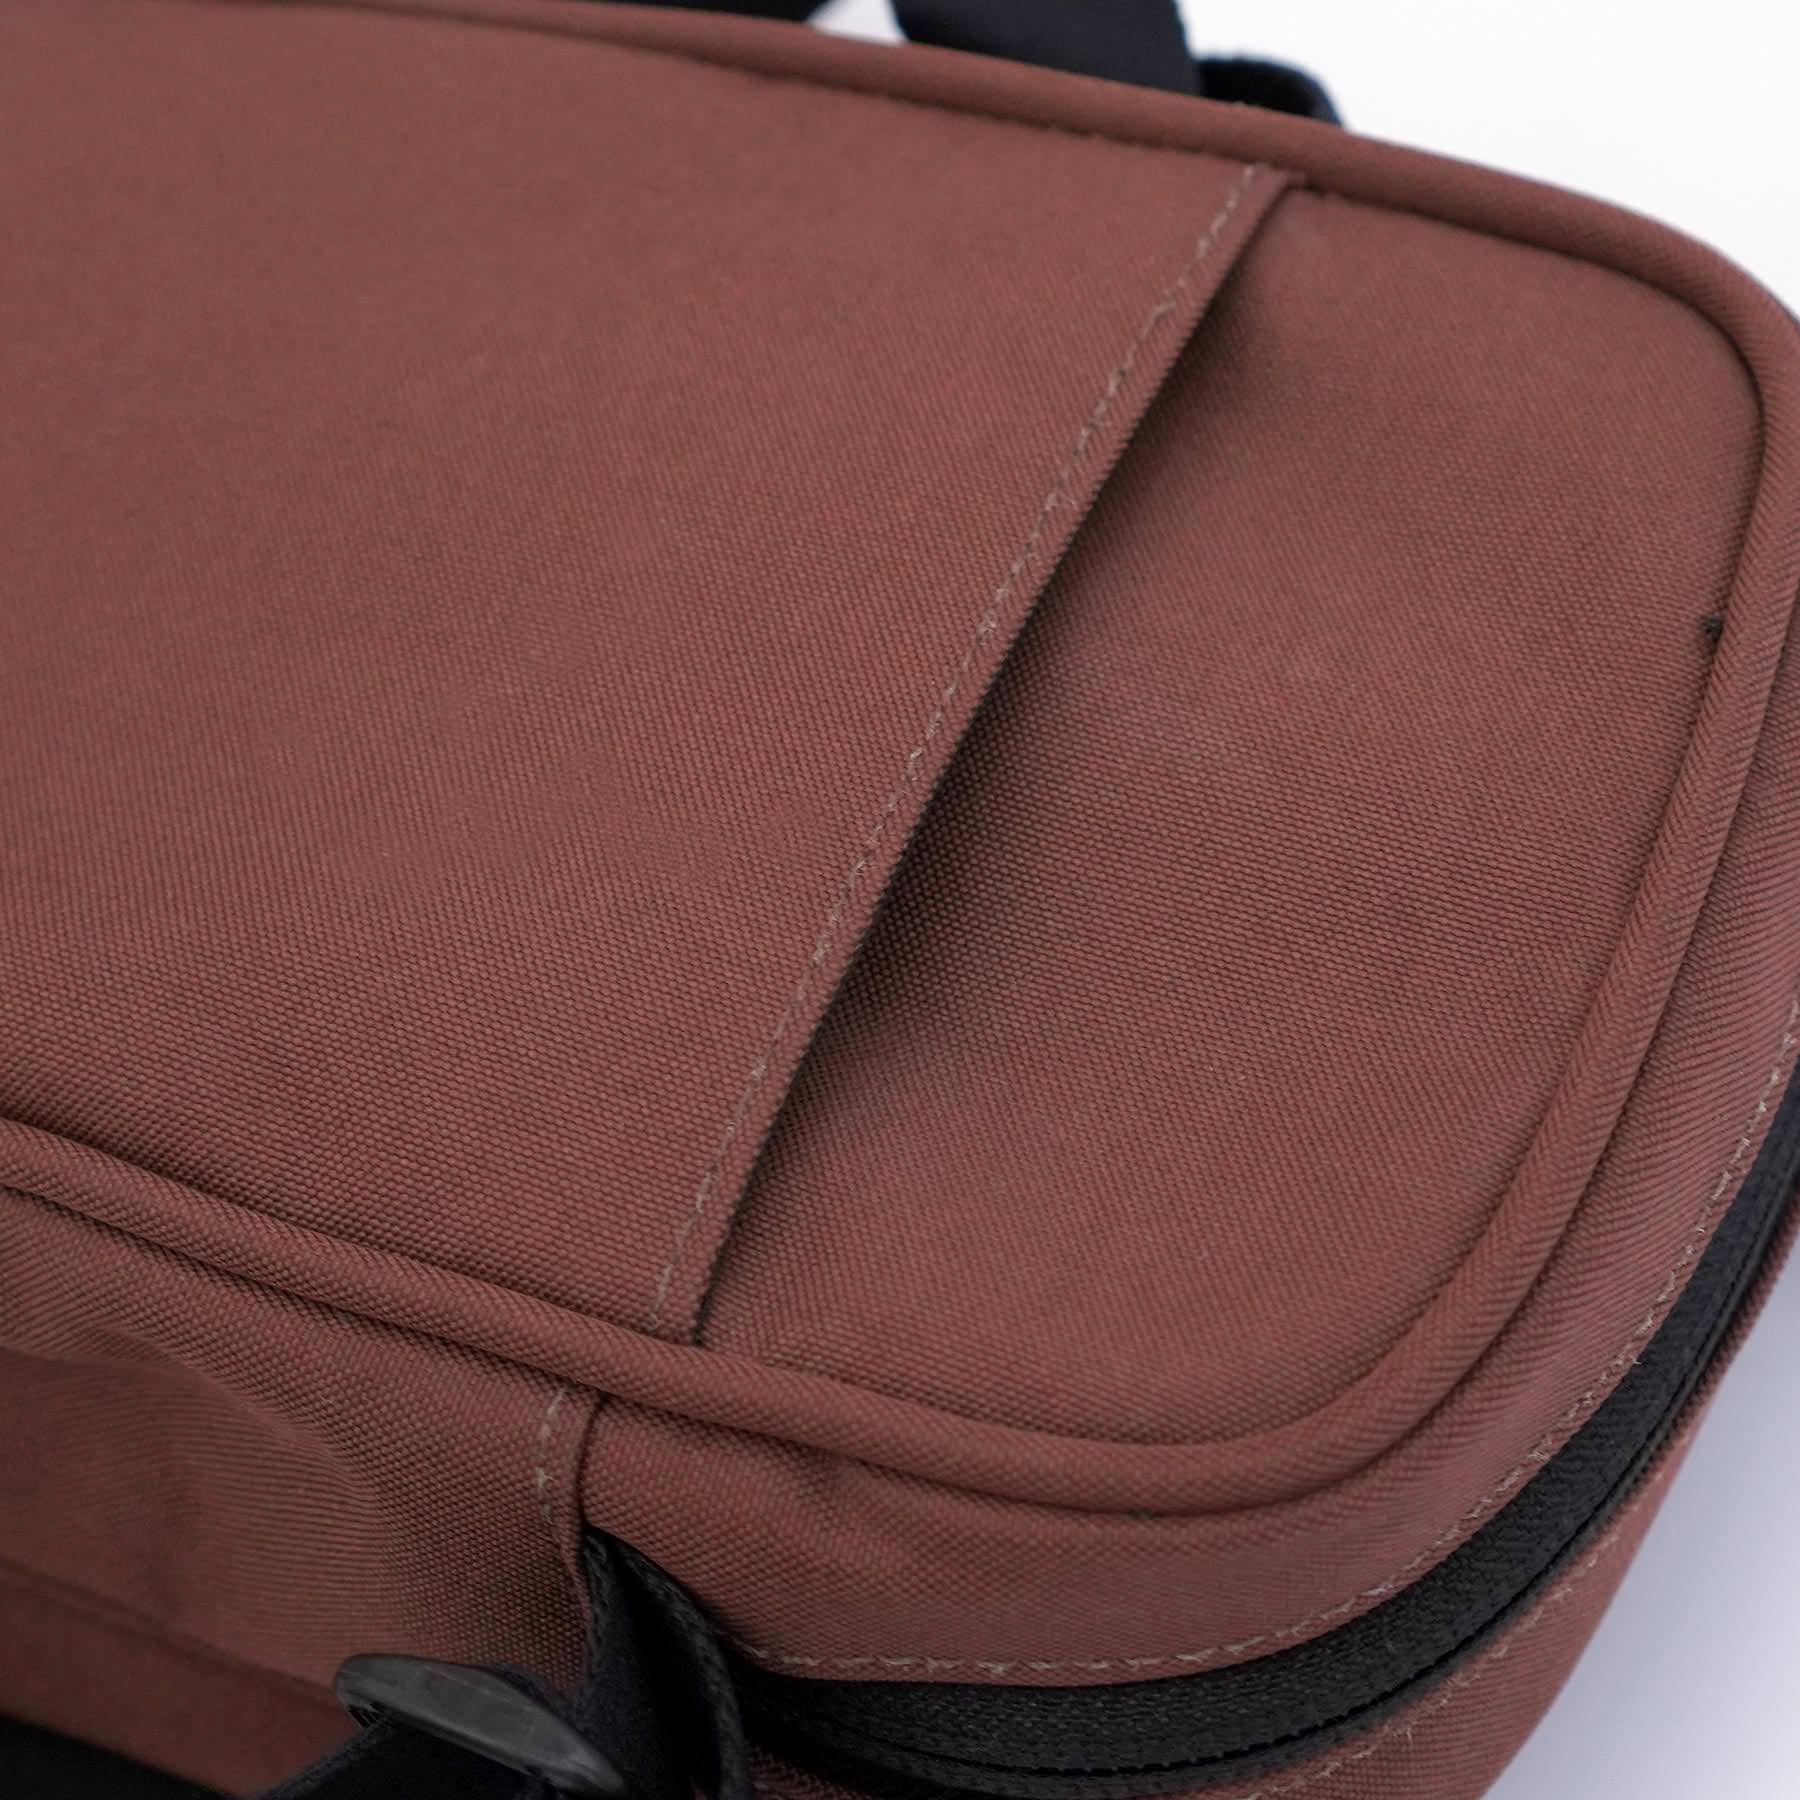 Small_Shoulder_Bag_Brown